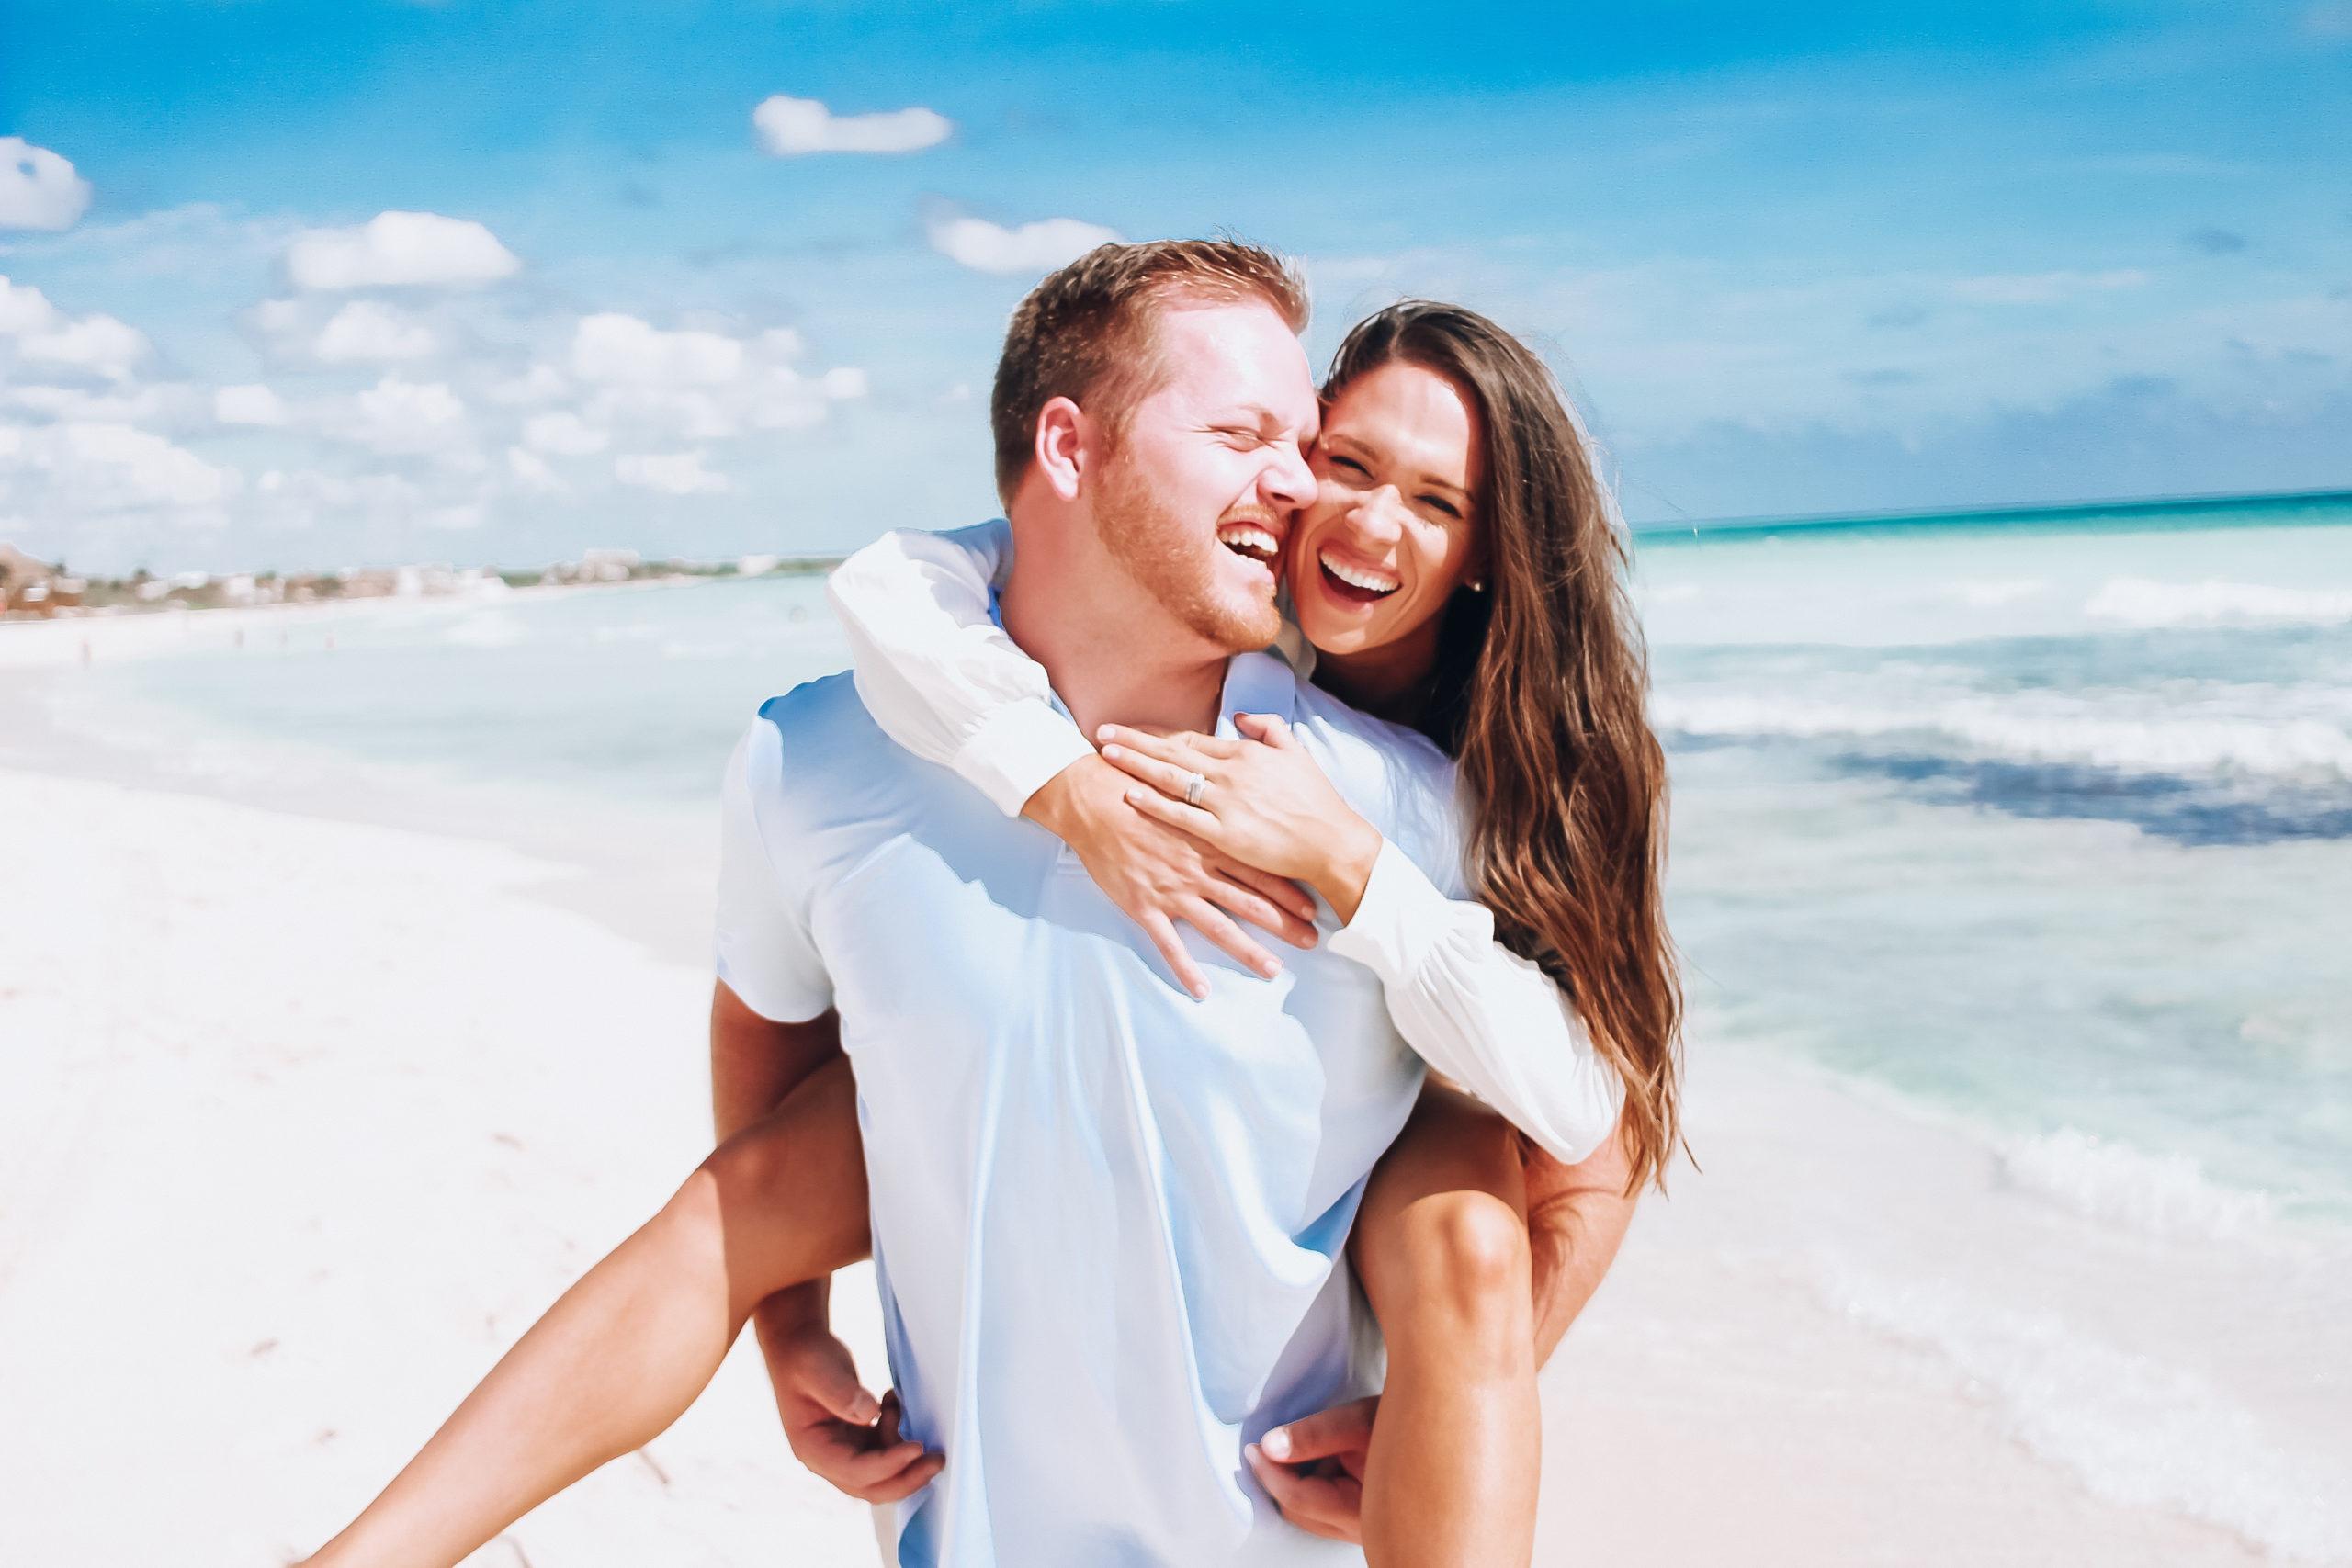 Couples Photography on the Beach- Mattison Heatherly